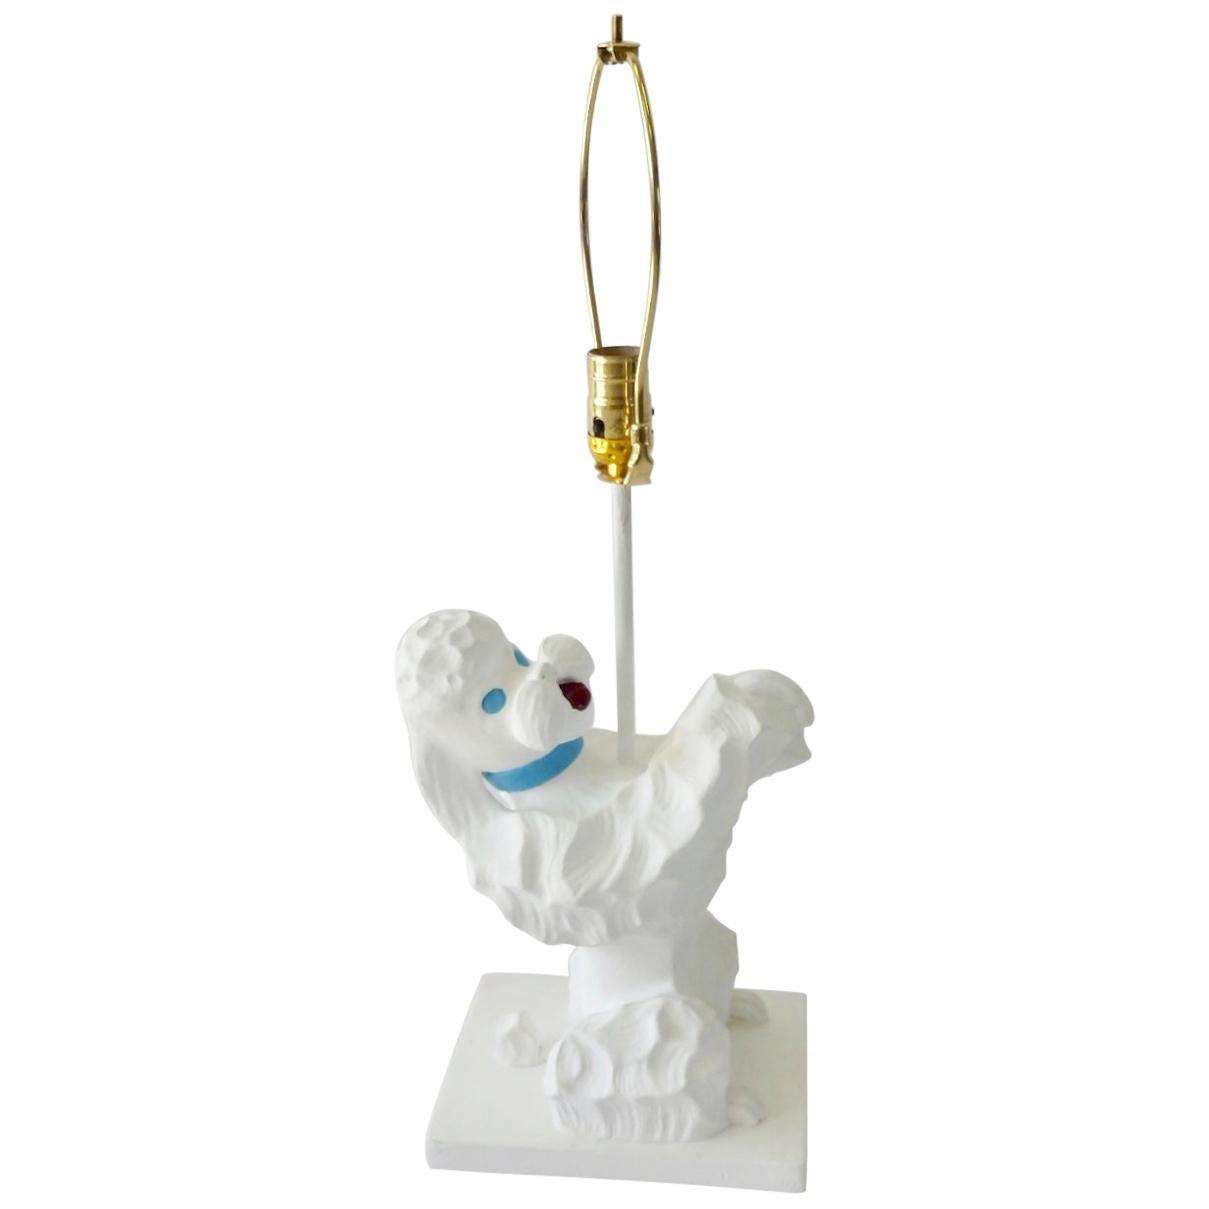 Kitsch Hollywood Regency Plaster Poodle Table Lamp